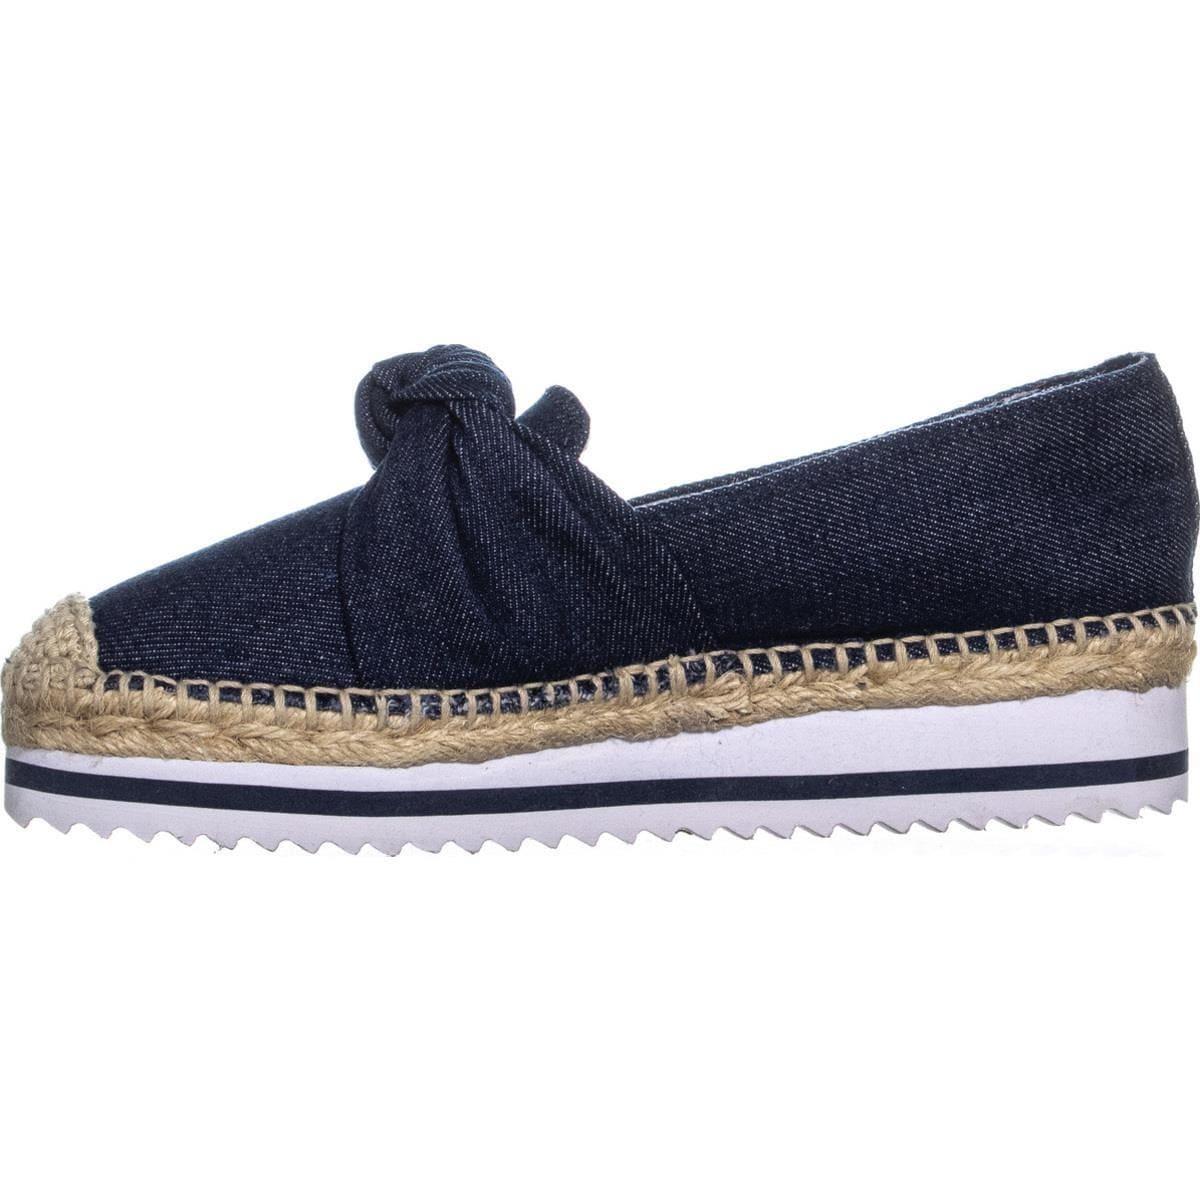 1d5323066186 Shop ESPRIT Hollis Platform Espadrilles Slip On Sneakers